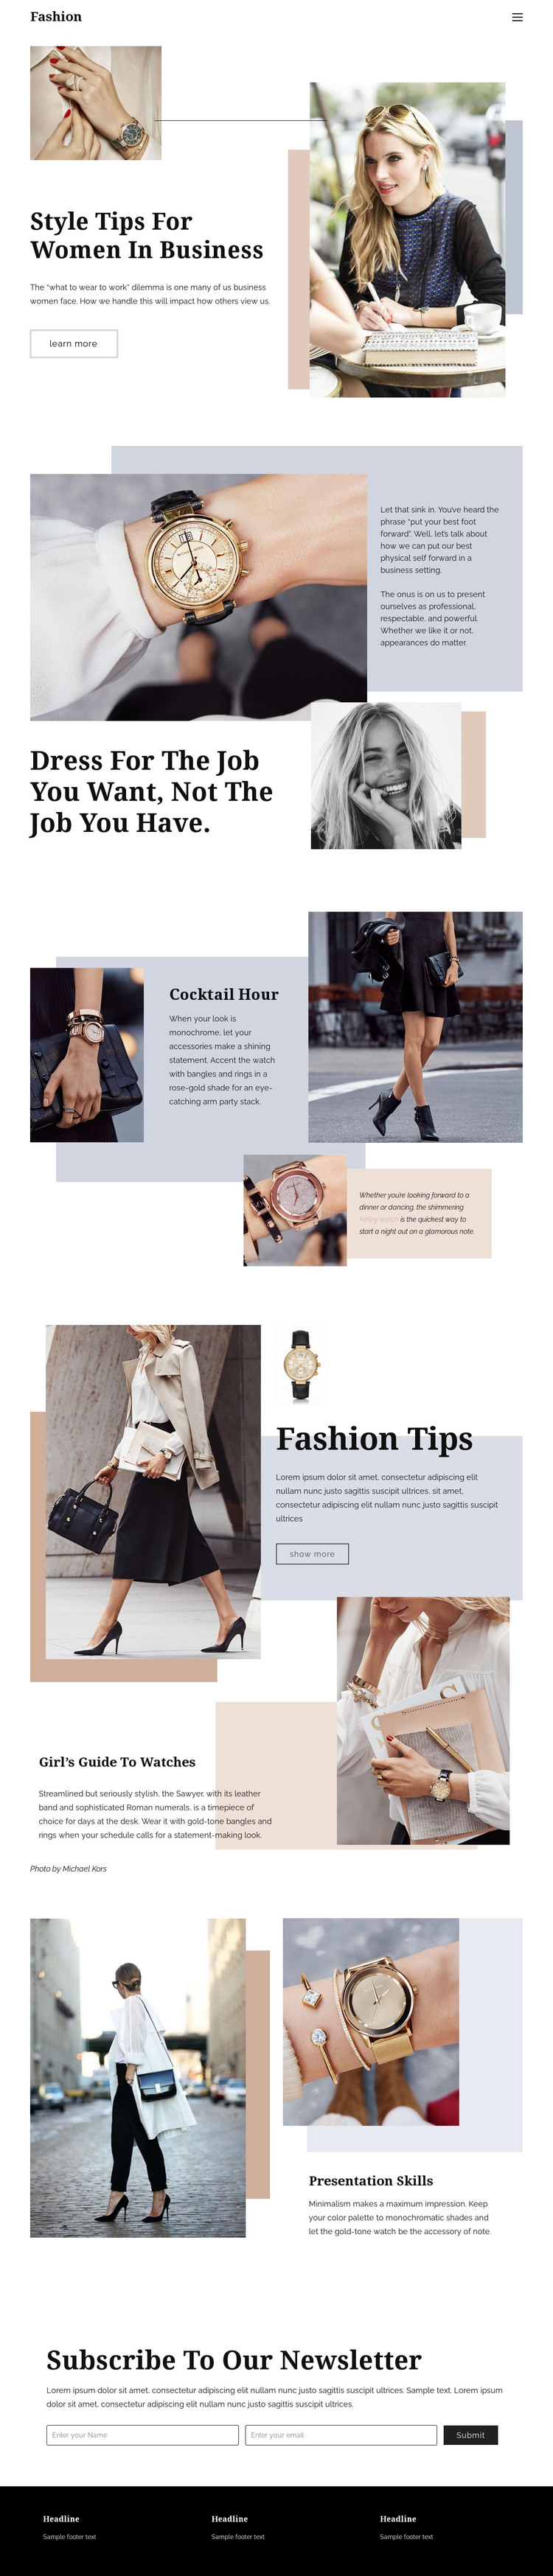 Fashion tips HTML Template